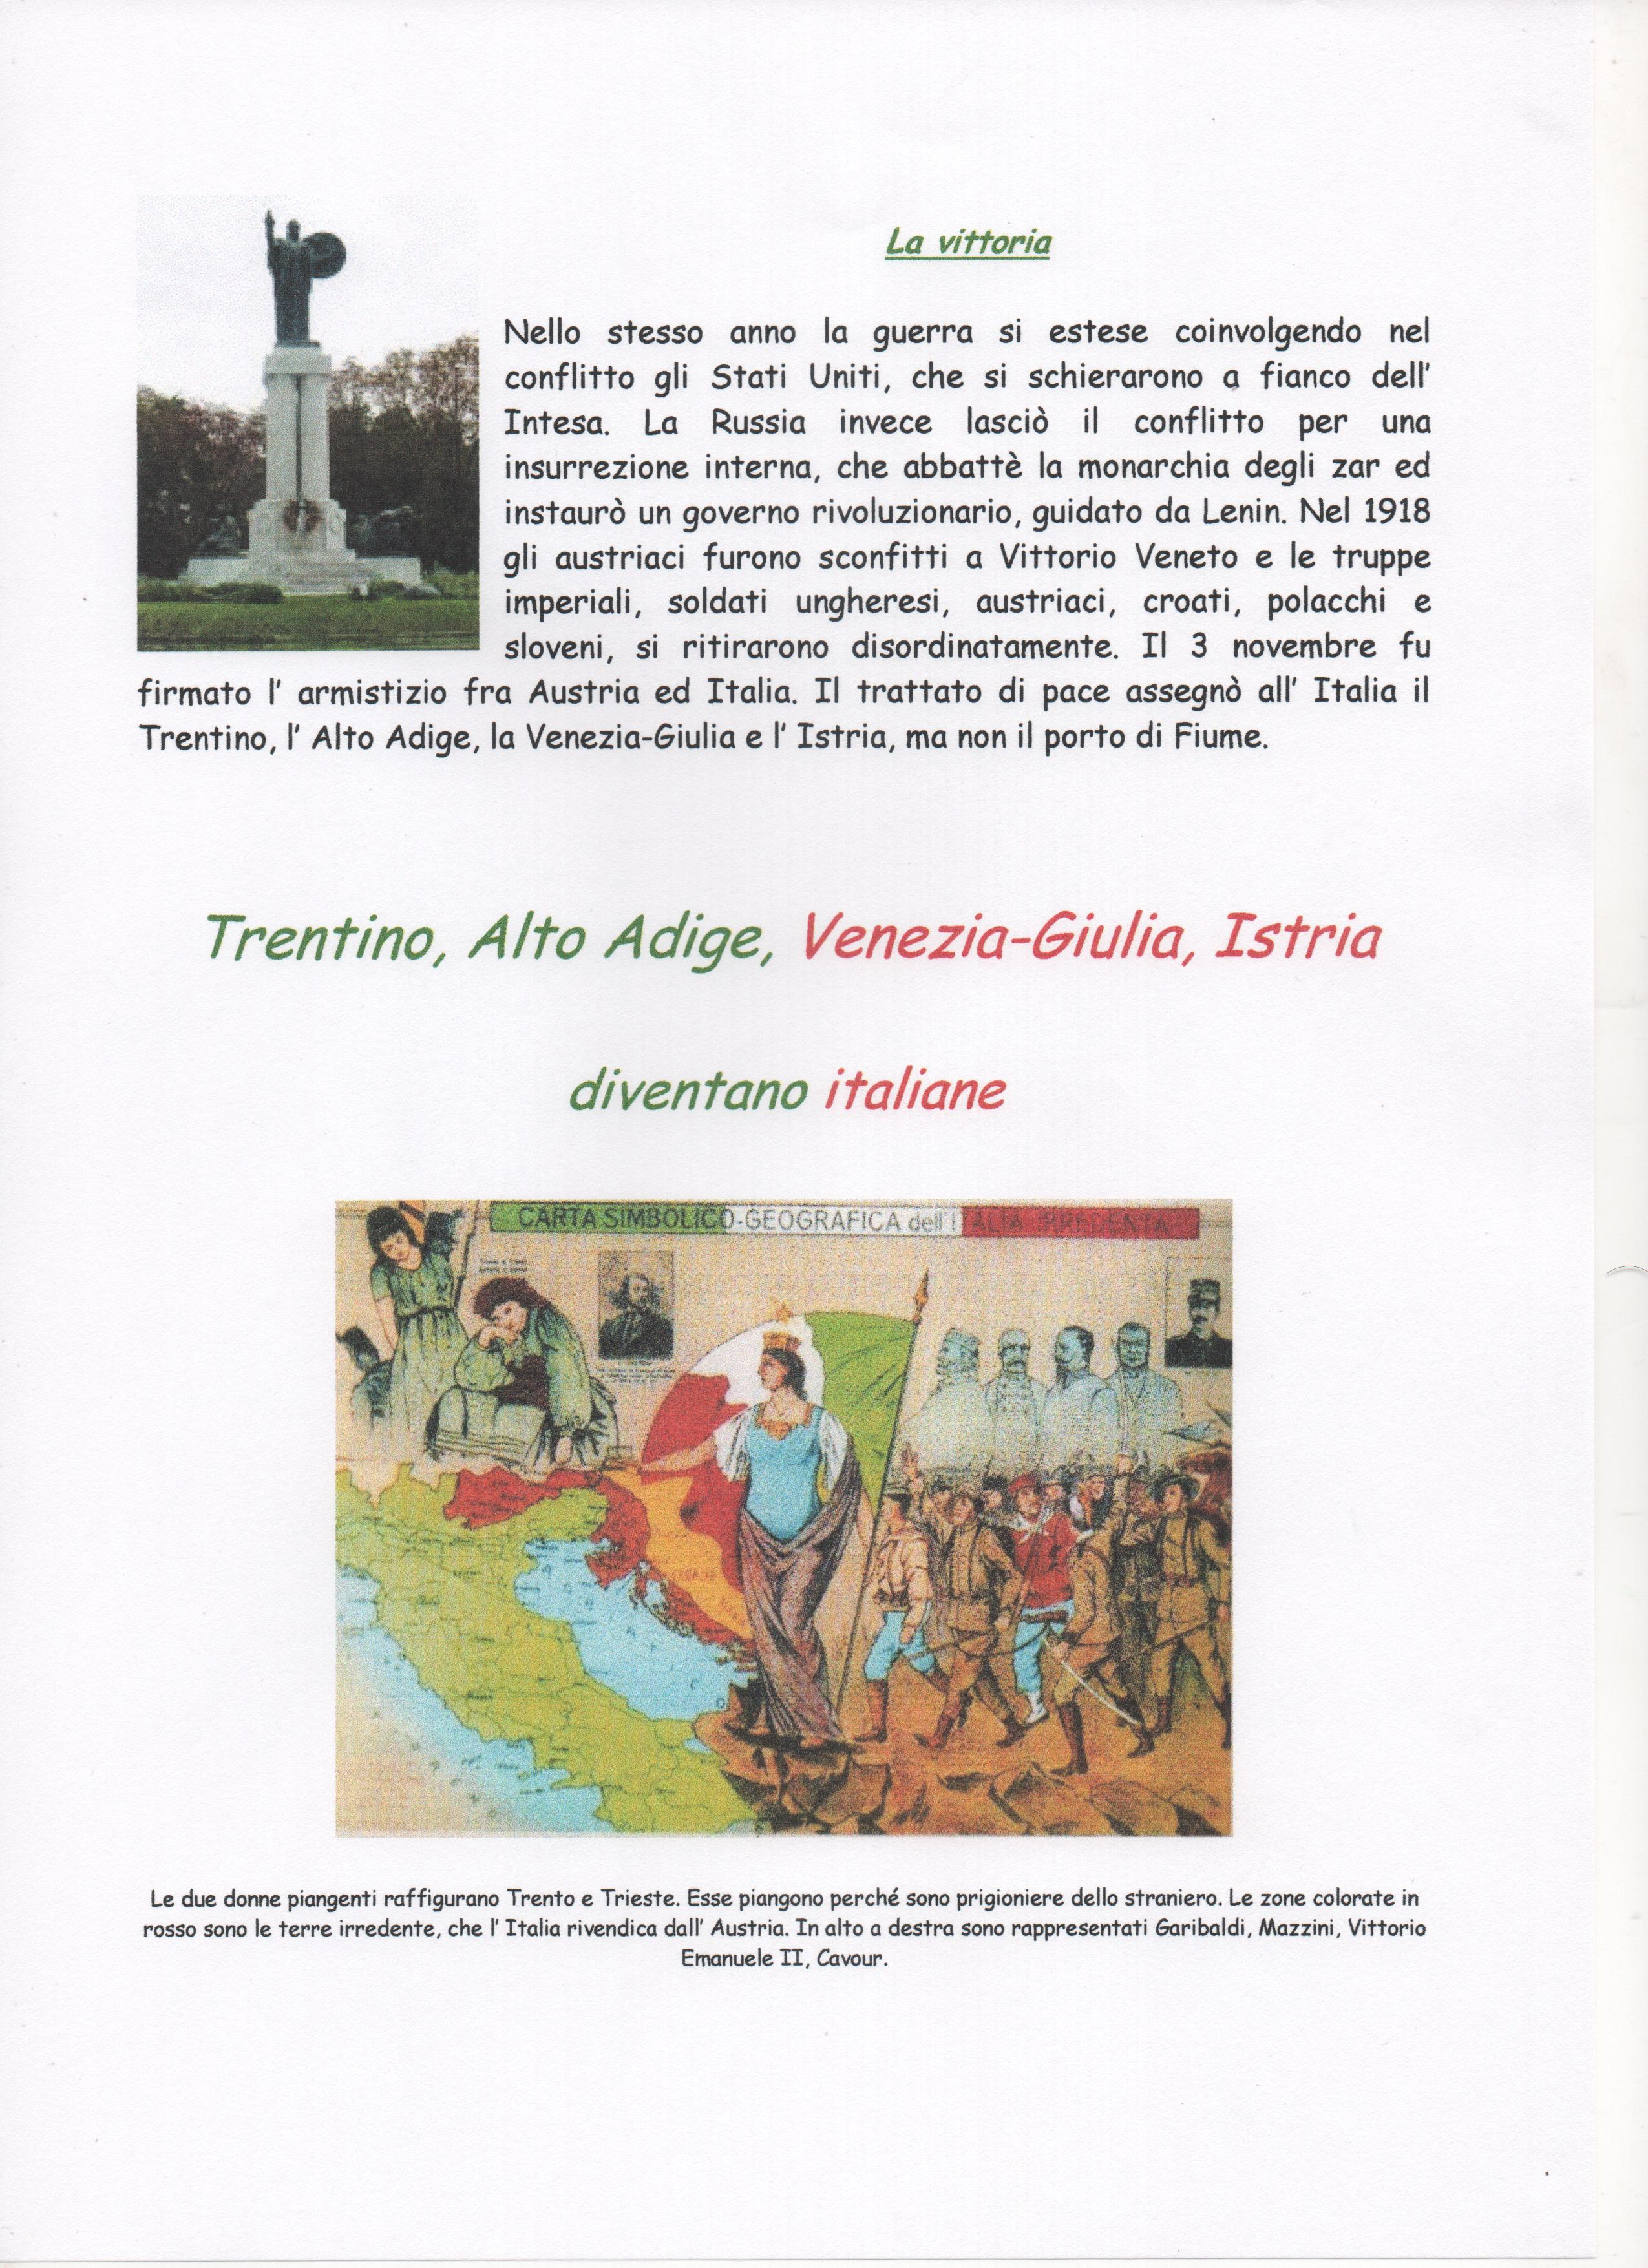 4_3_terre_irredente